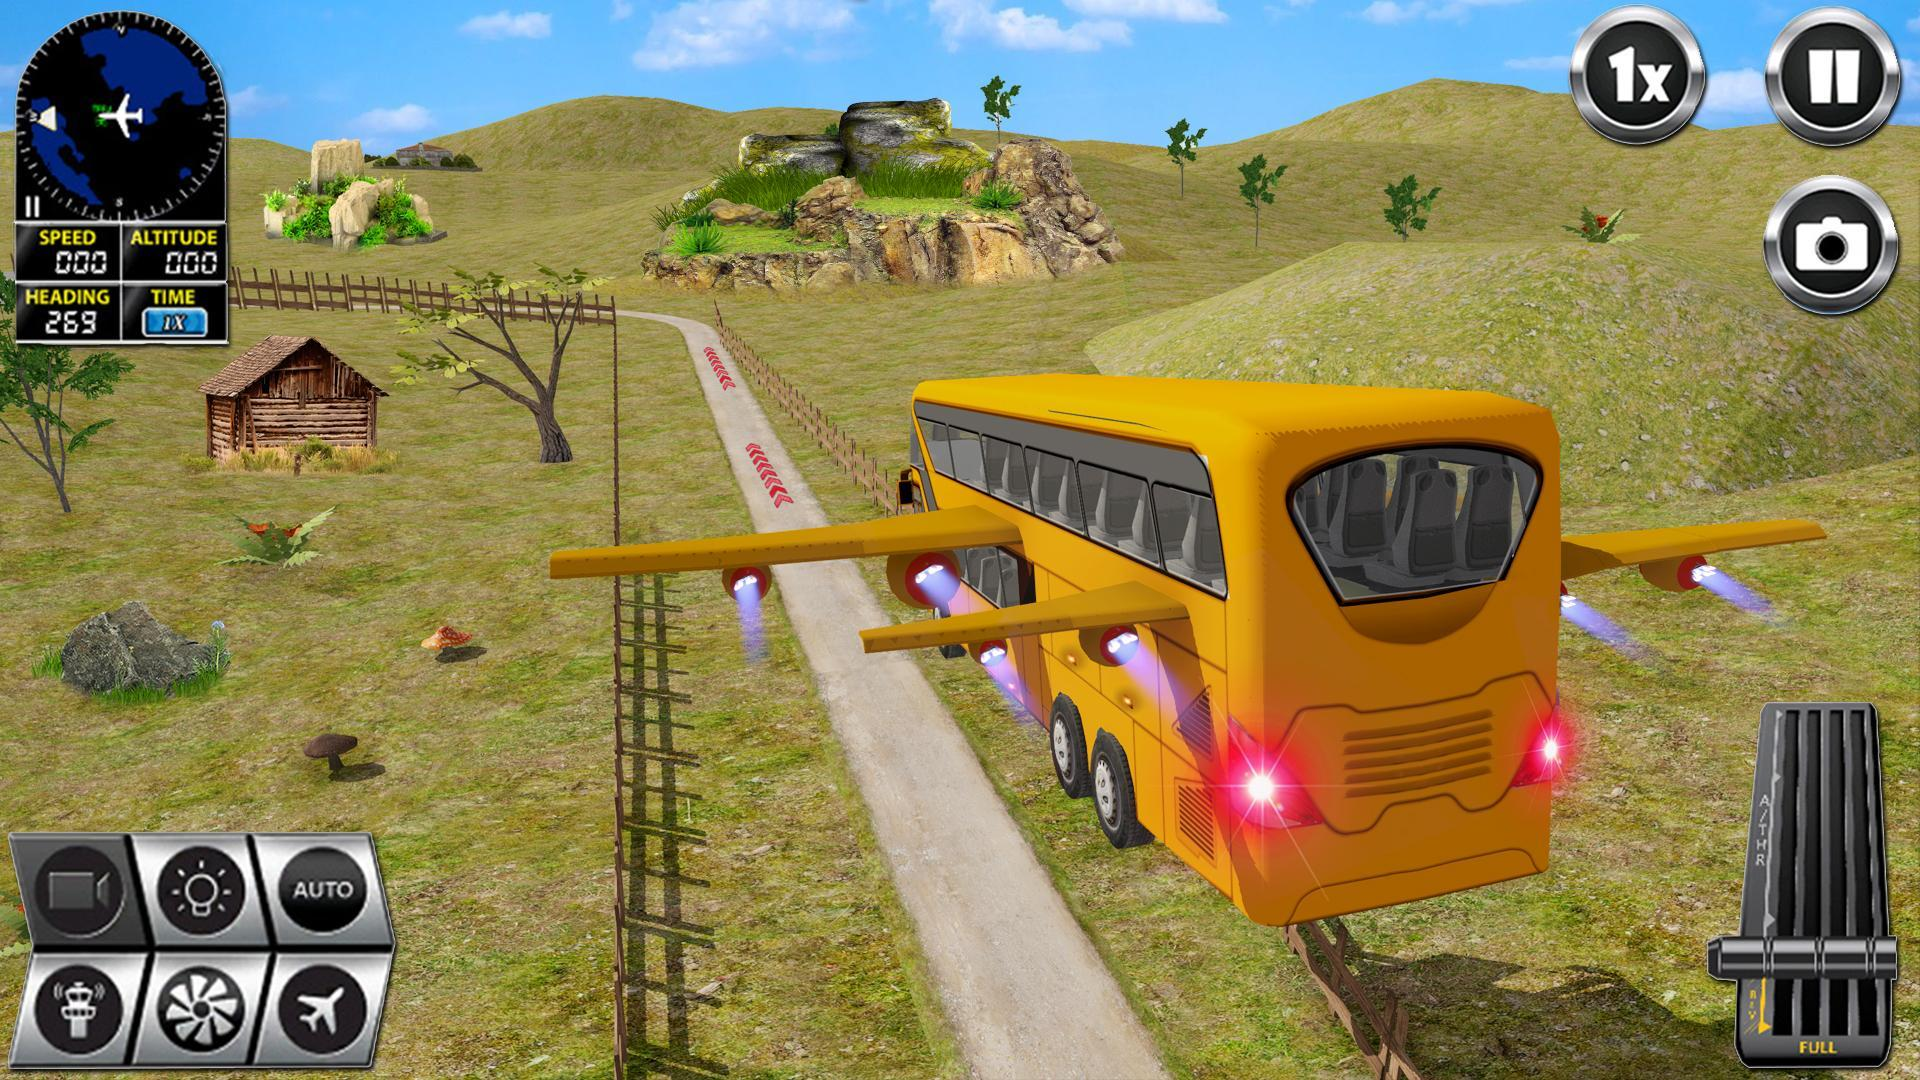 Flying Bus Driving simulator 2019: Free Bus Games 2.8 Screenshot 12